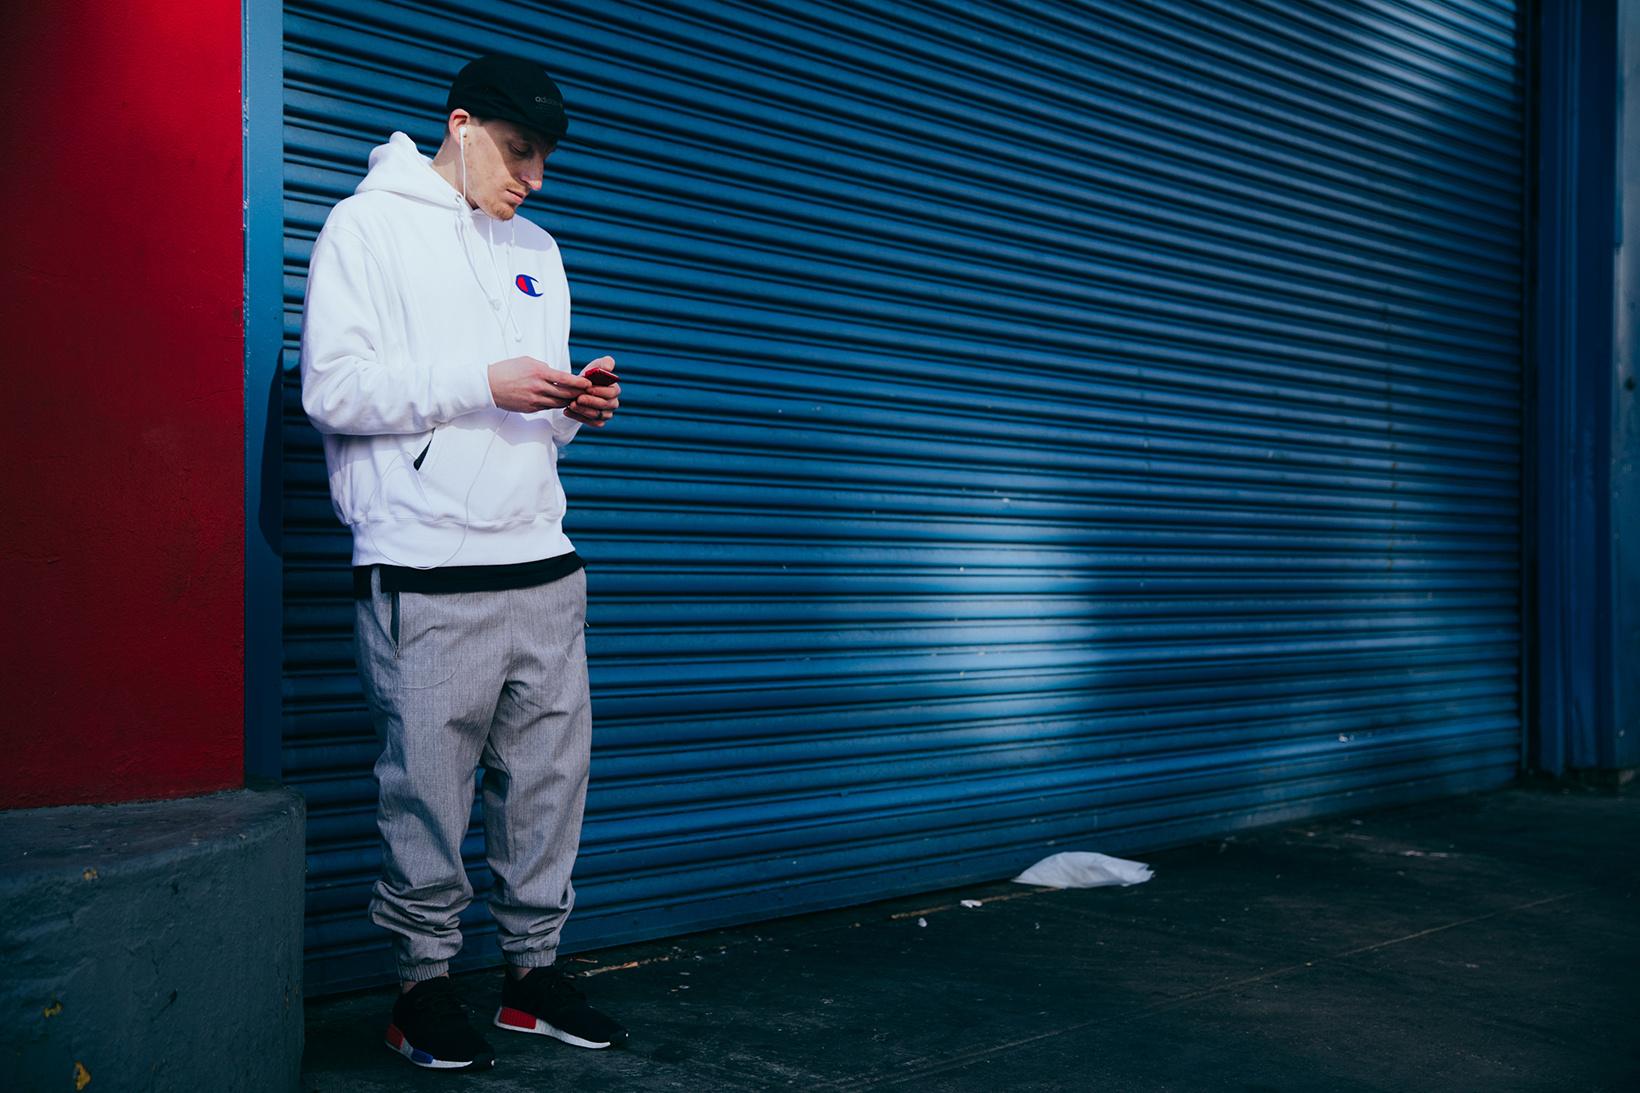 YEEZY SEASON 5 Streetsnaps What People Wore - 3732554